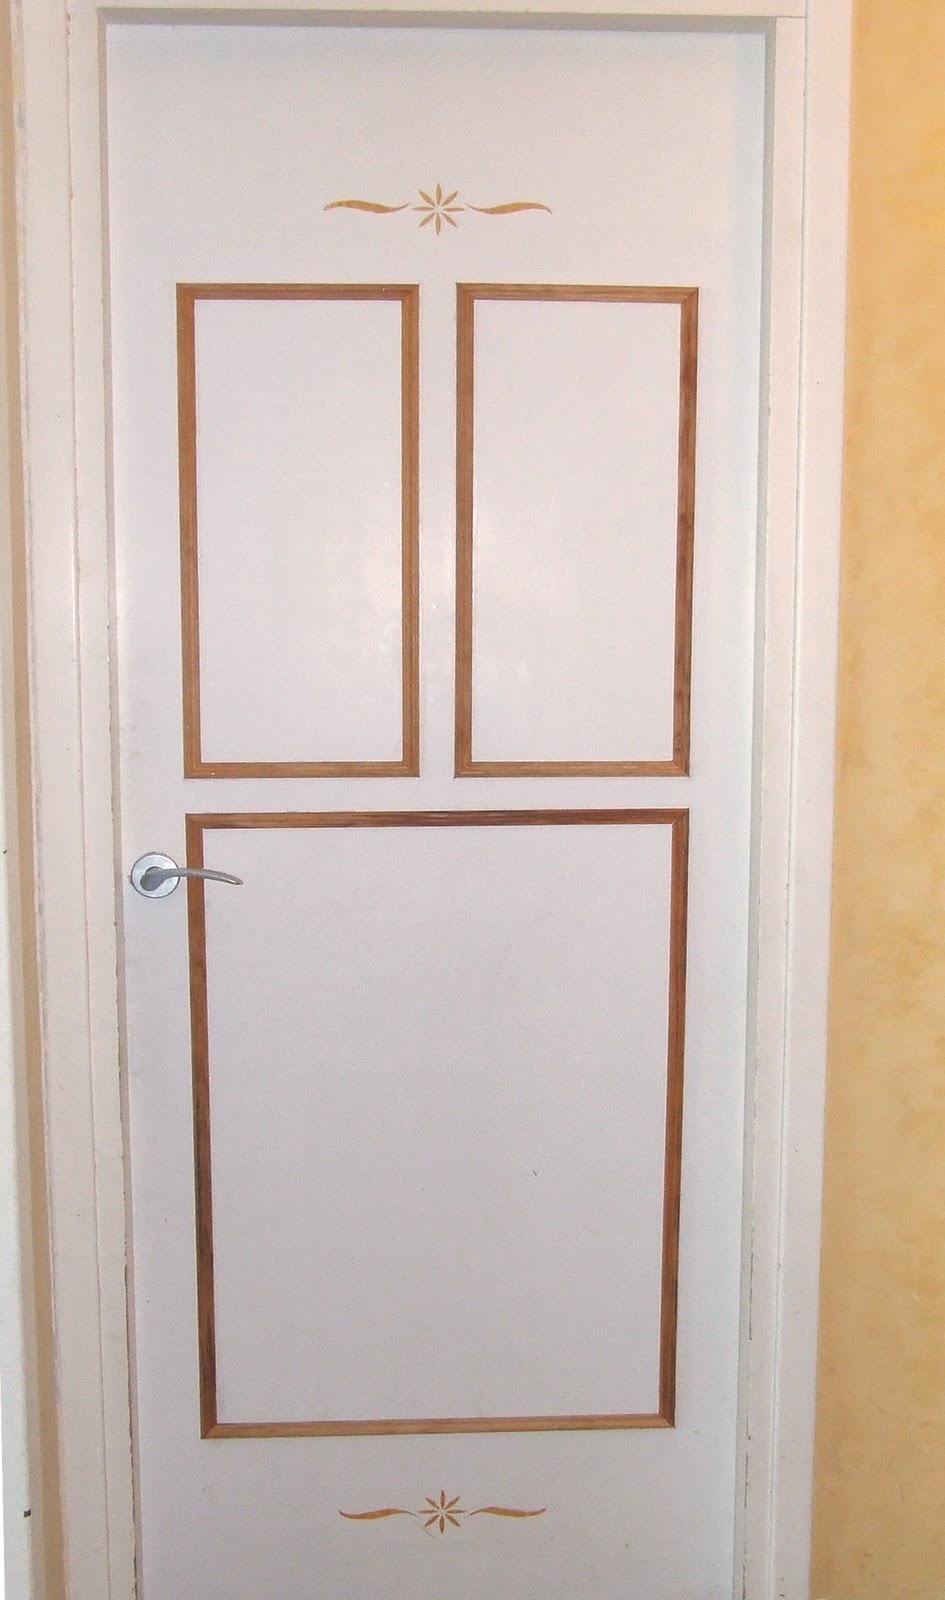 Puertas para pintar imagui for Pintar marcos de puertas